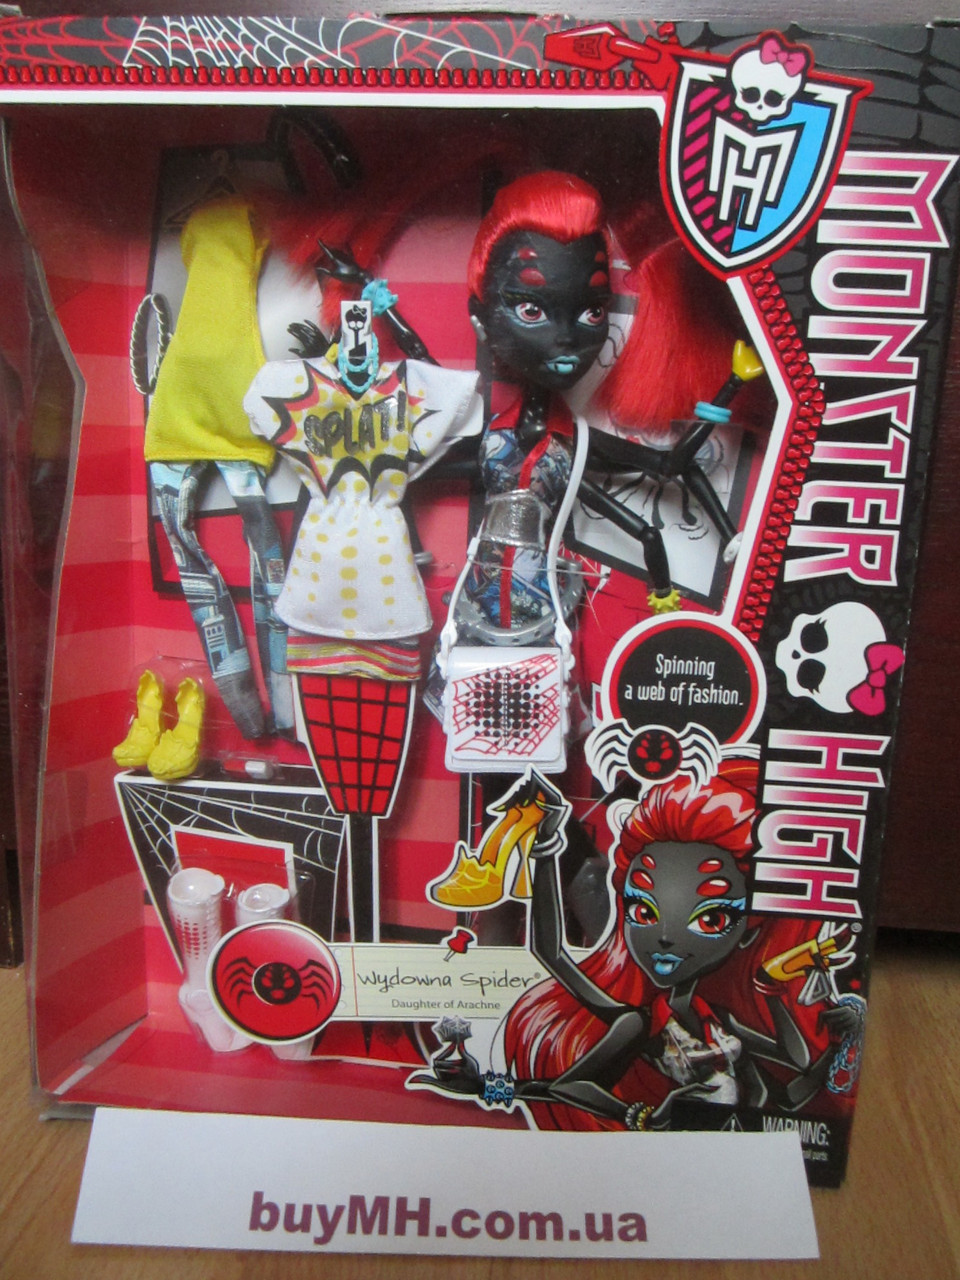 "Кукла Monster High WYDOWNA SPIDER I Love Fashion Doll Вайдона Спайдер (Вебарелла) Я люблю моду - Интернет-магазин ""Best Toys"" в Киеве"